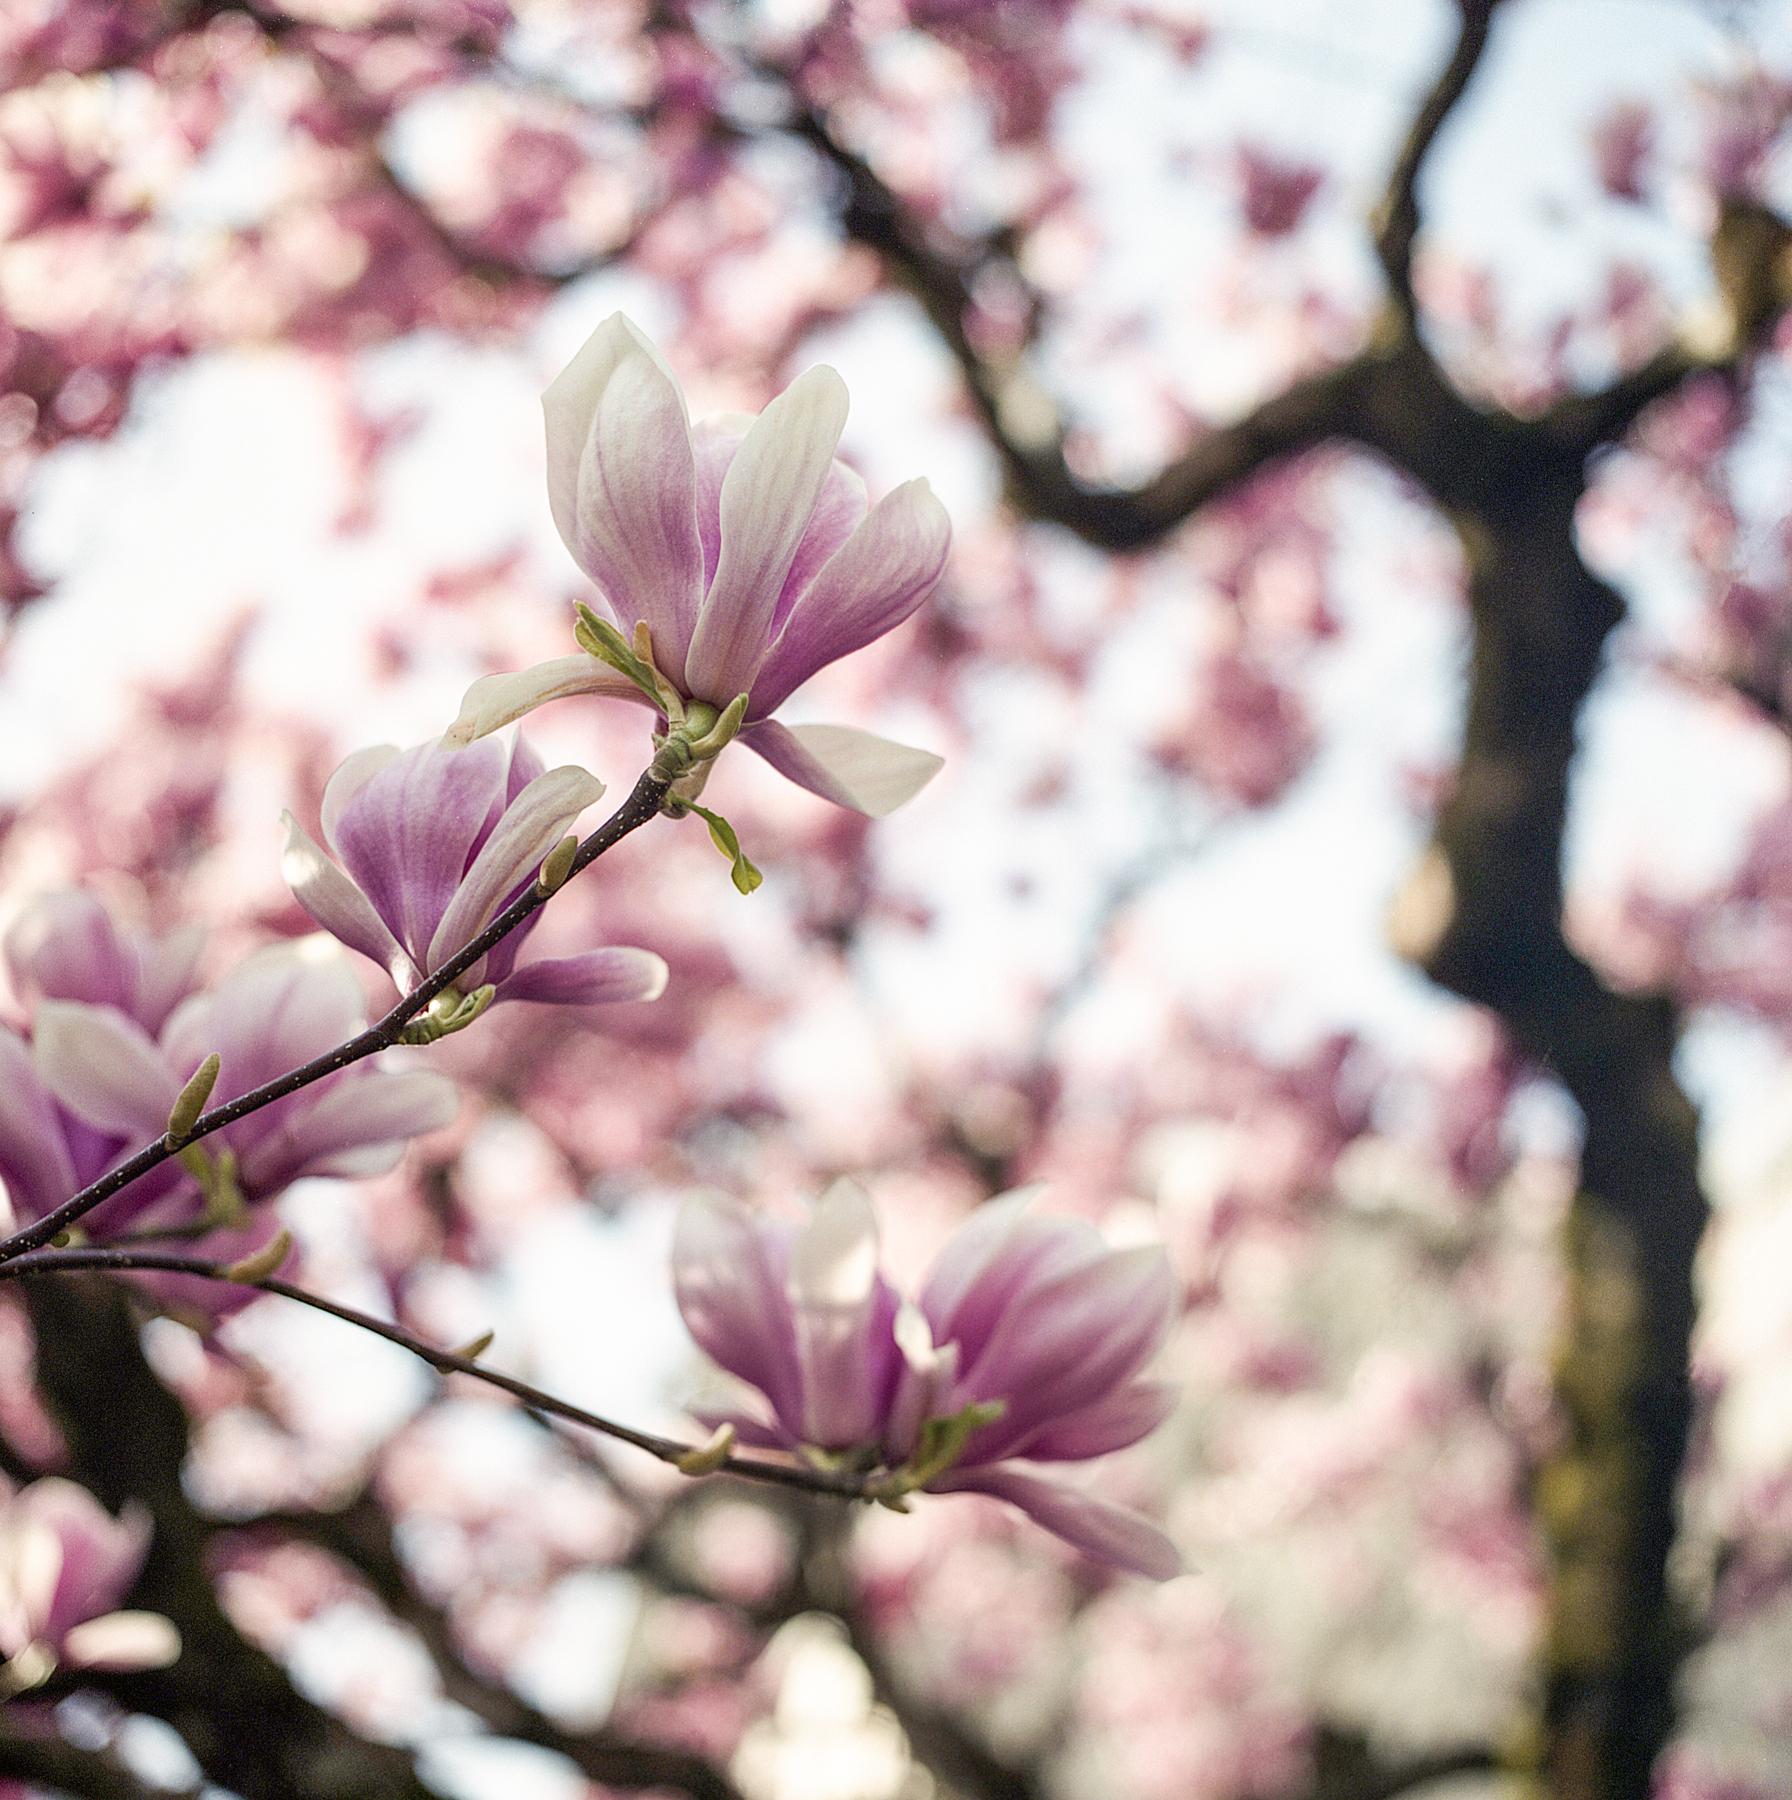 Magnolia | Hasselblad 500cm 80mm CT | Fuji Pro 160NS | Aaron Bieleck